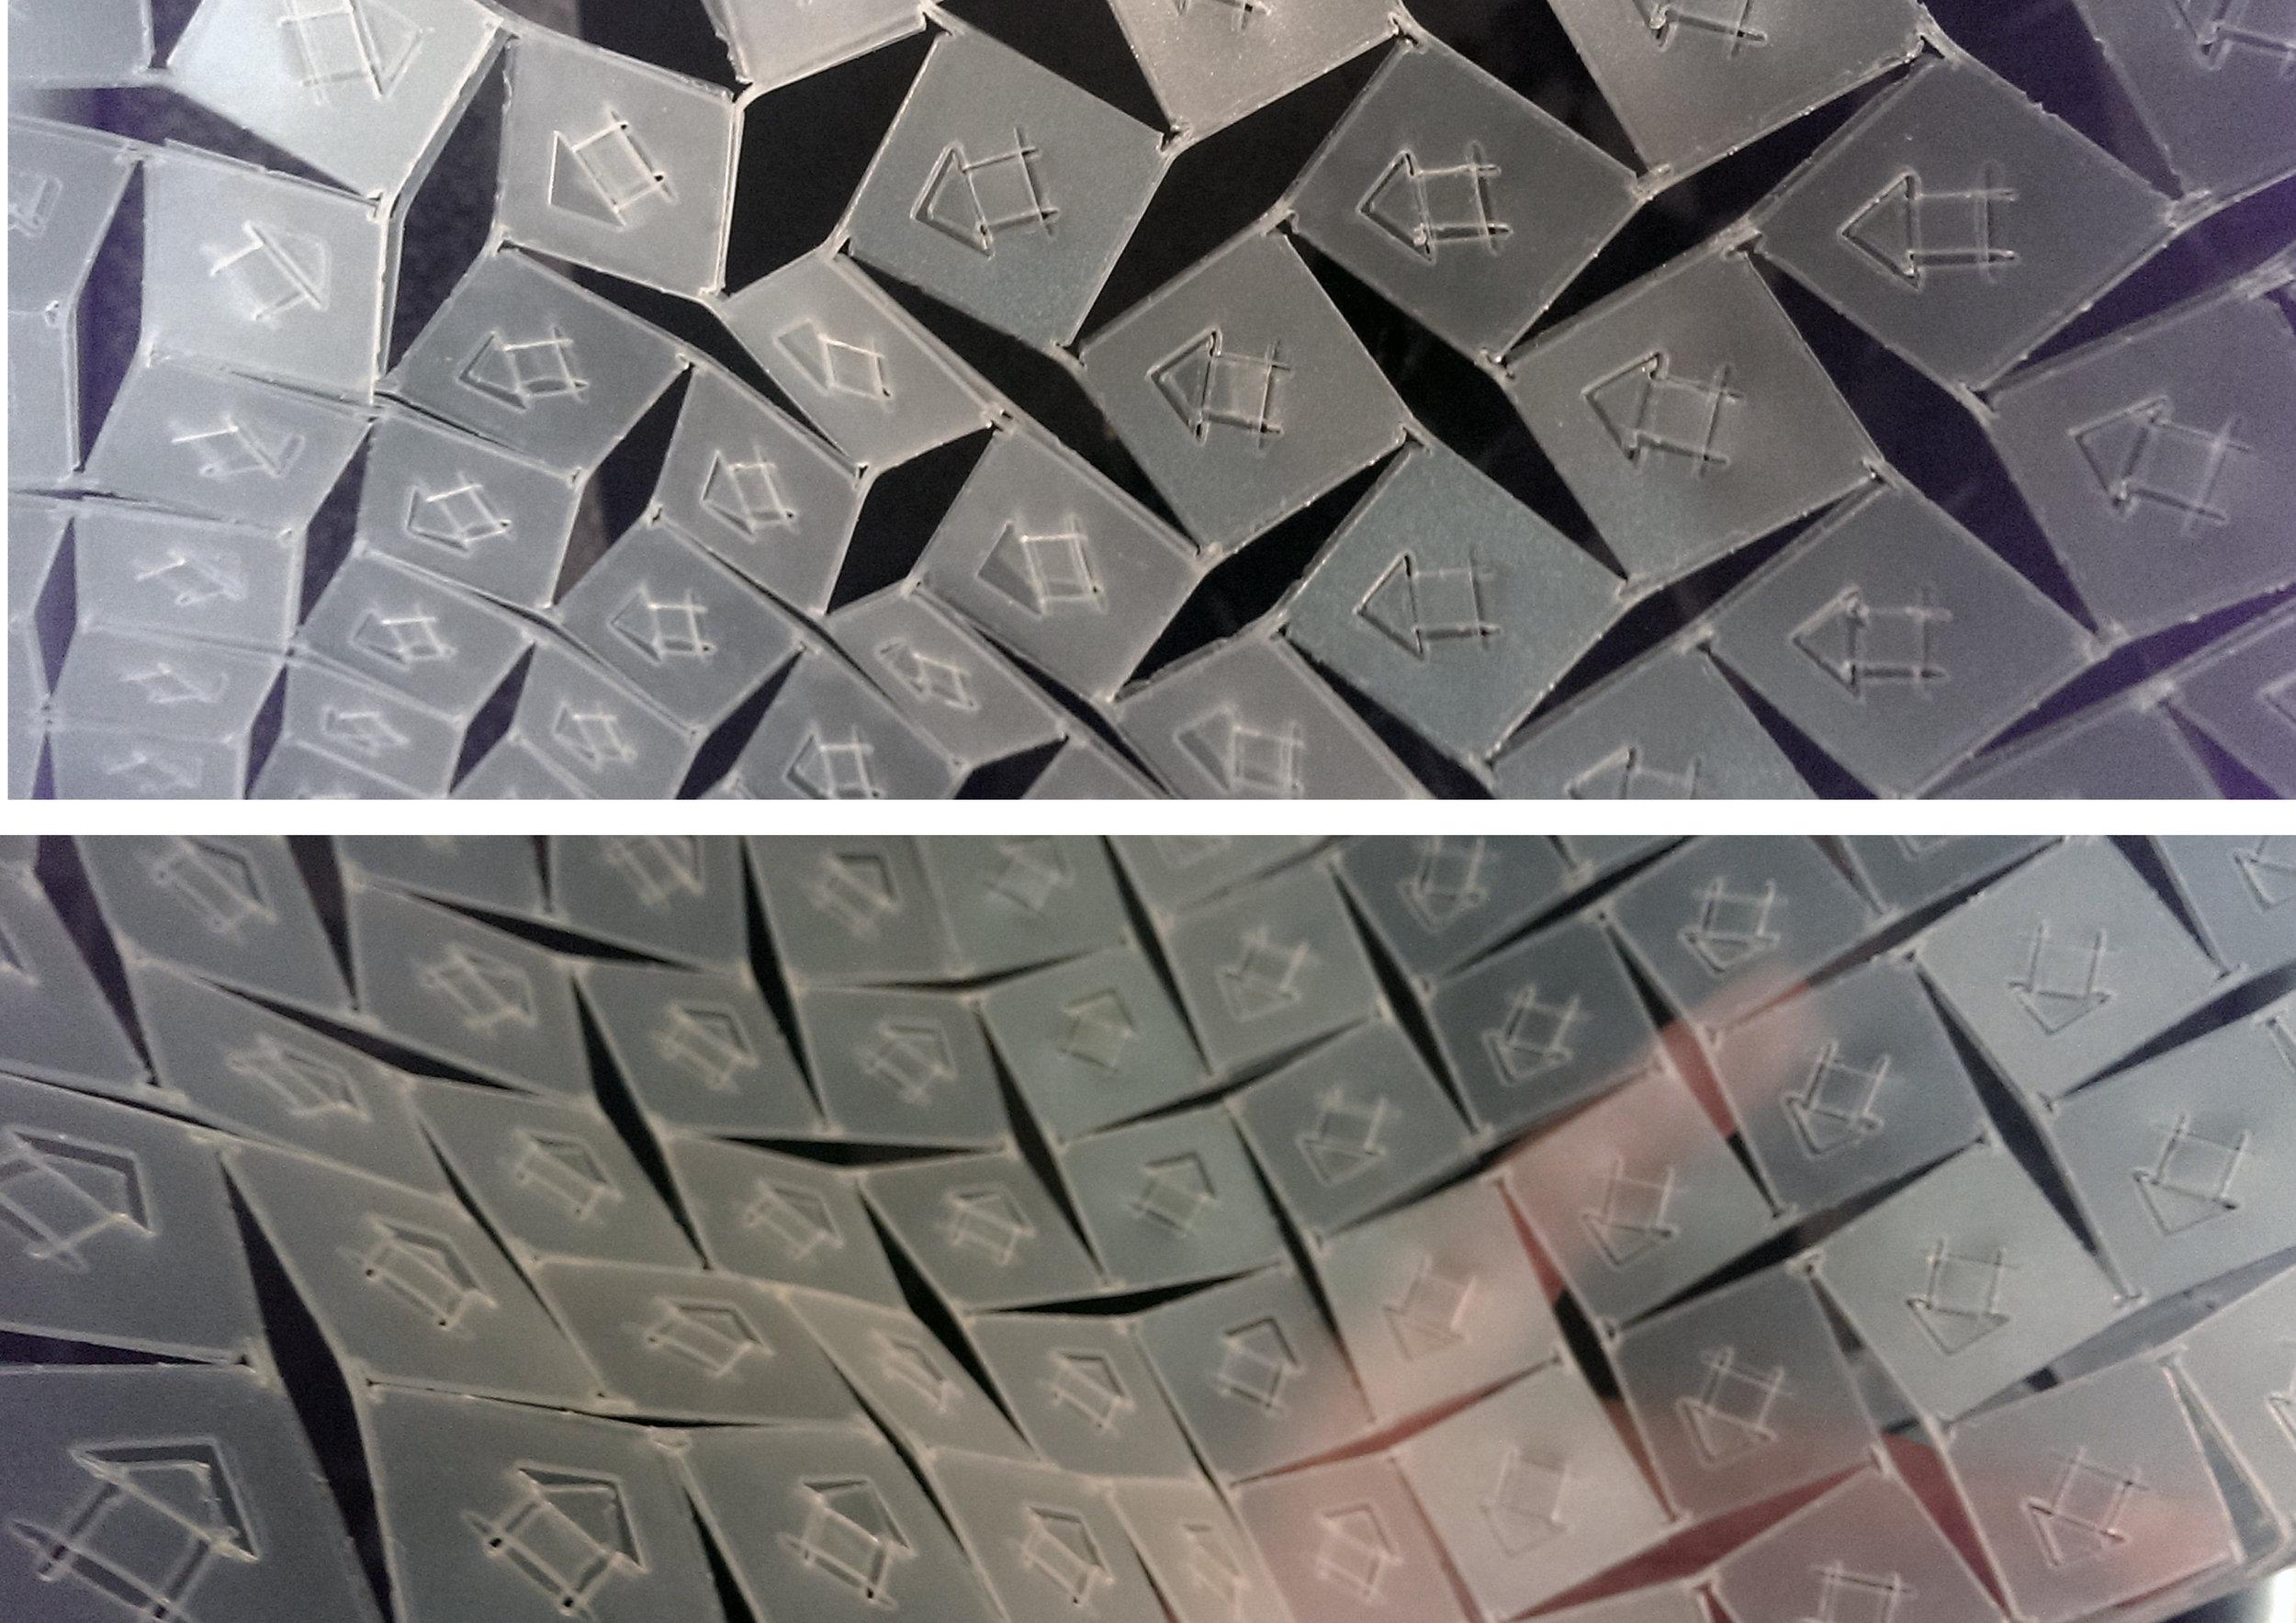 Kintetic Tiling 009.jpg